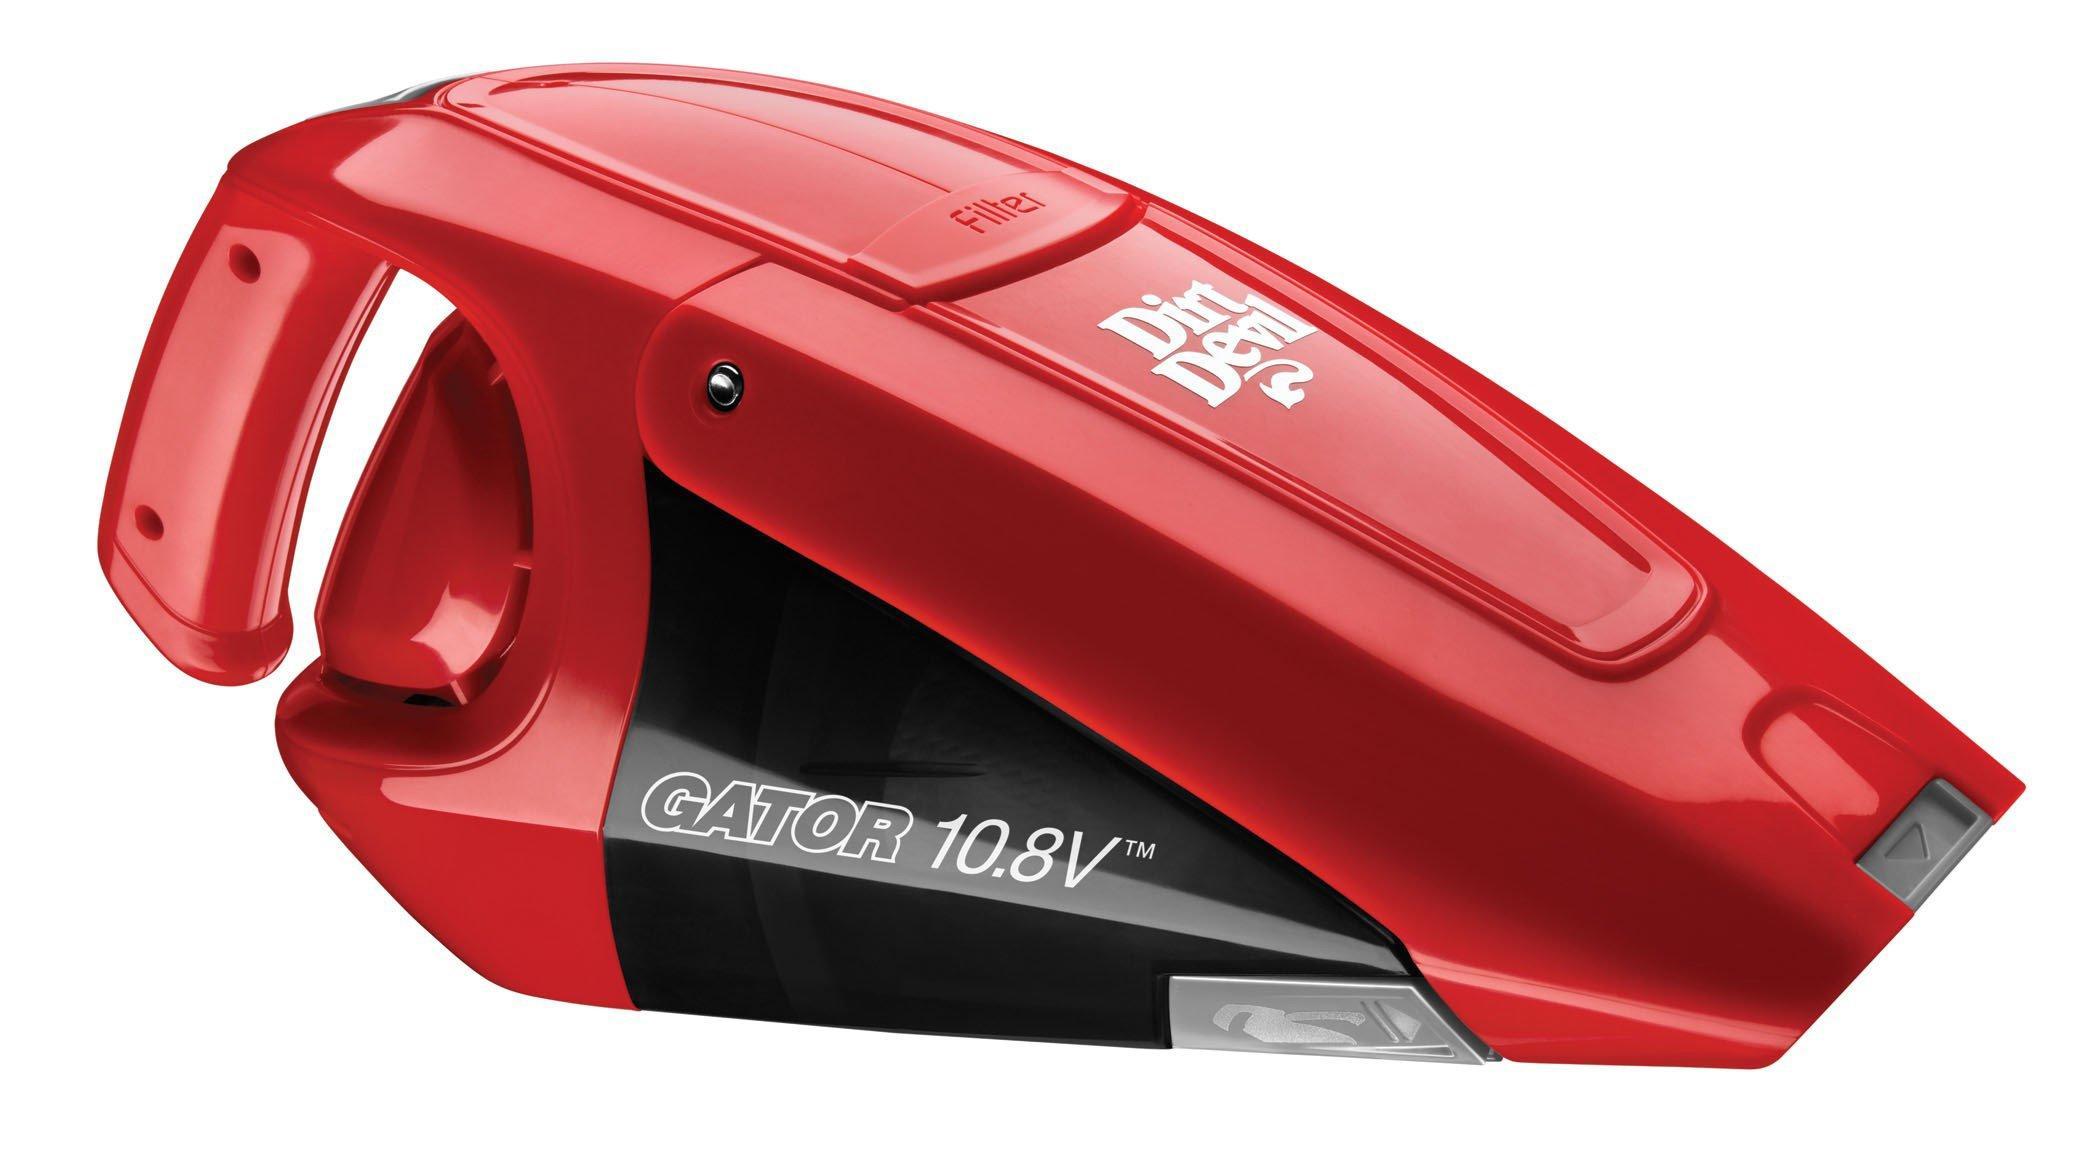 Reconditioned Gator 10.8V Cordless Bagless Handheld Vacuum1